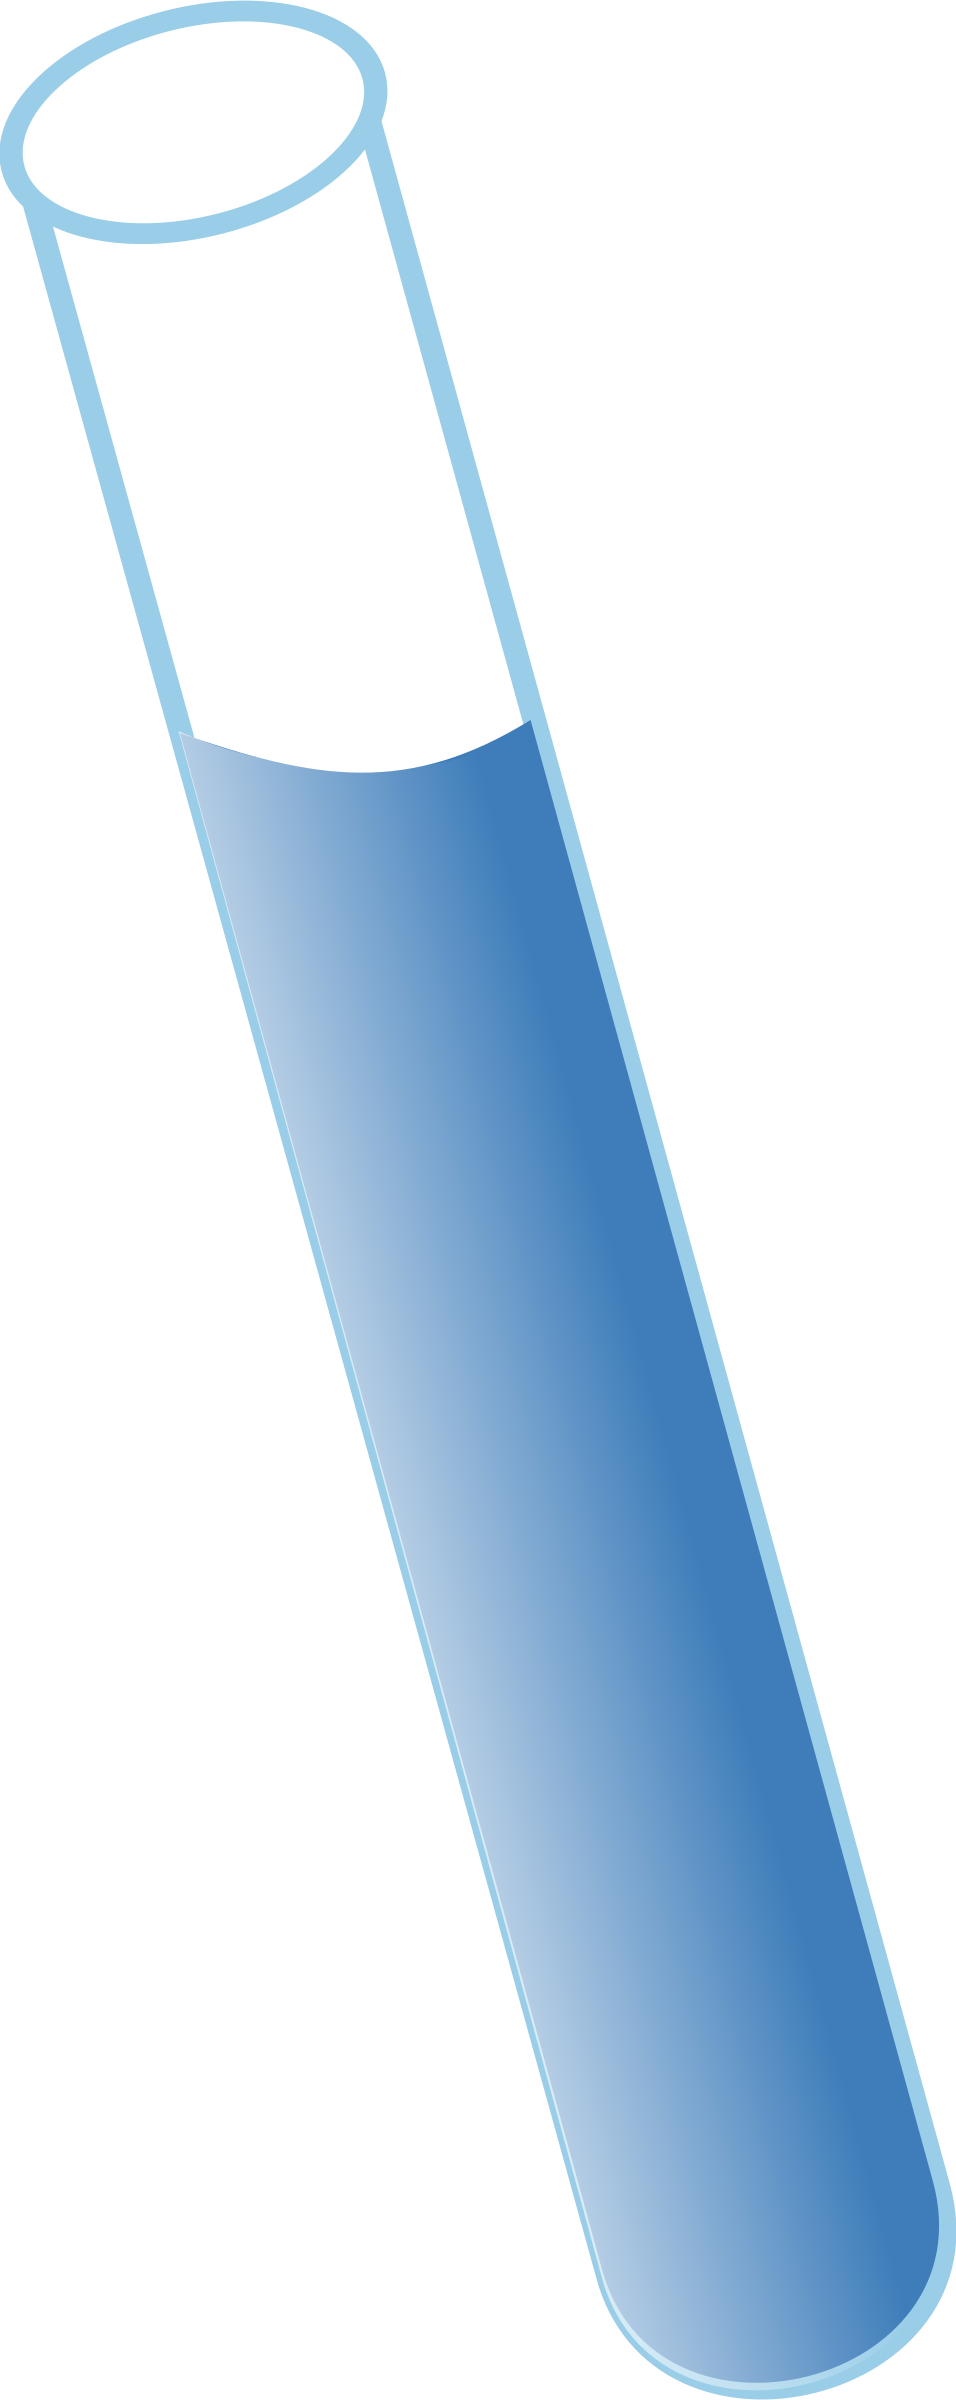 Clipart ruler blue. Test tube images free